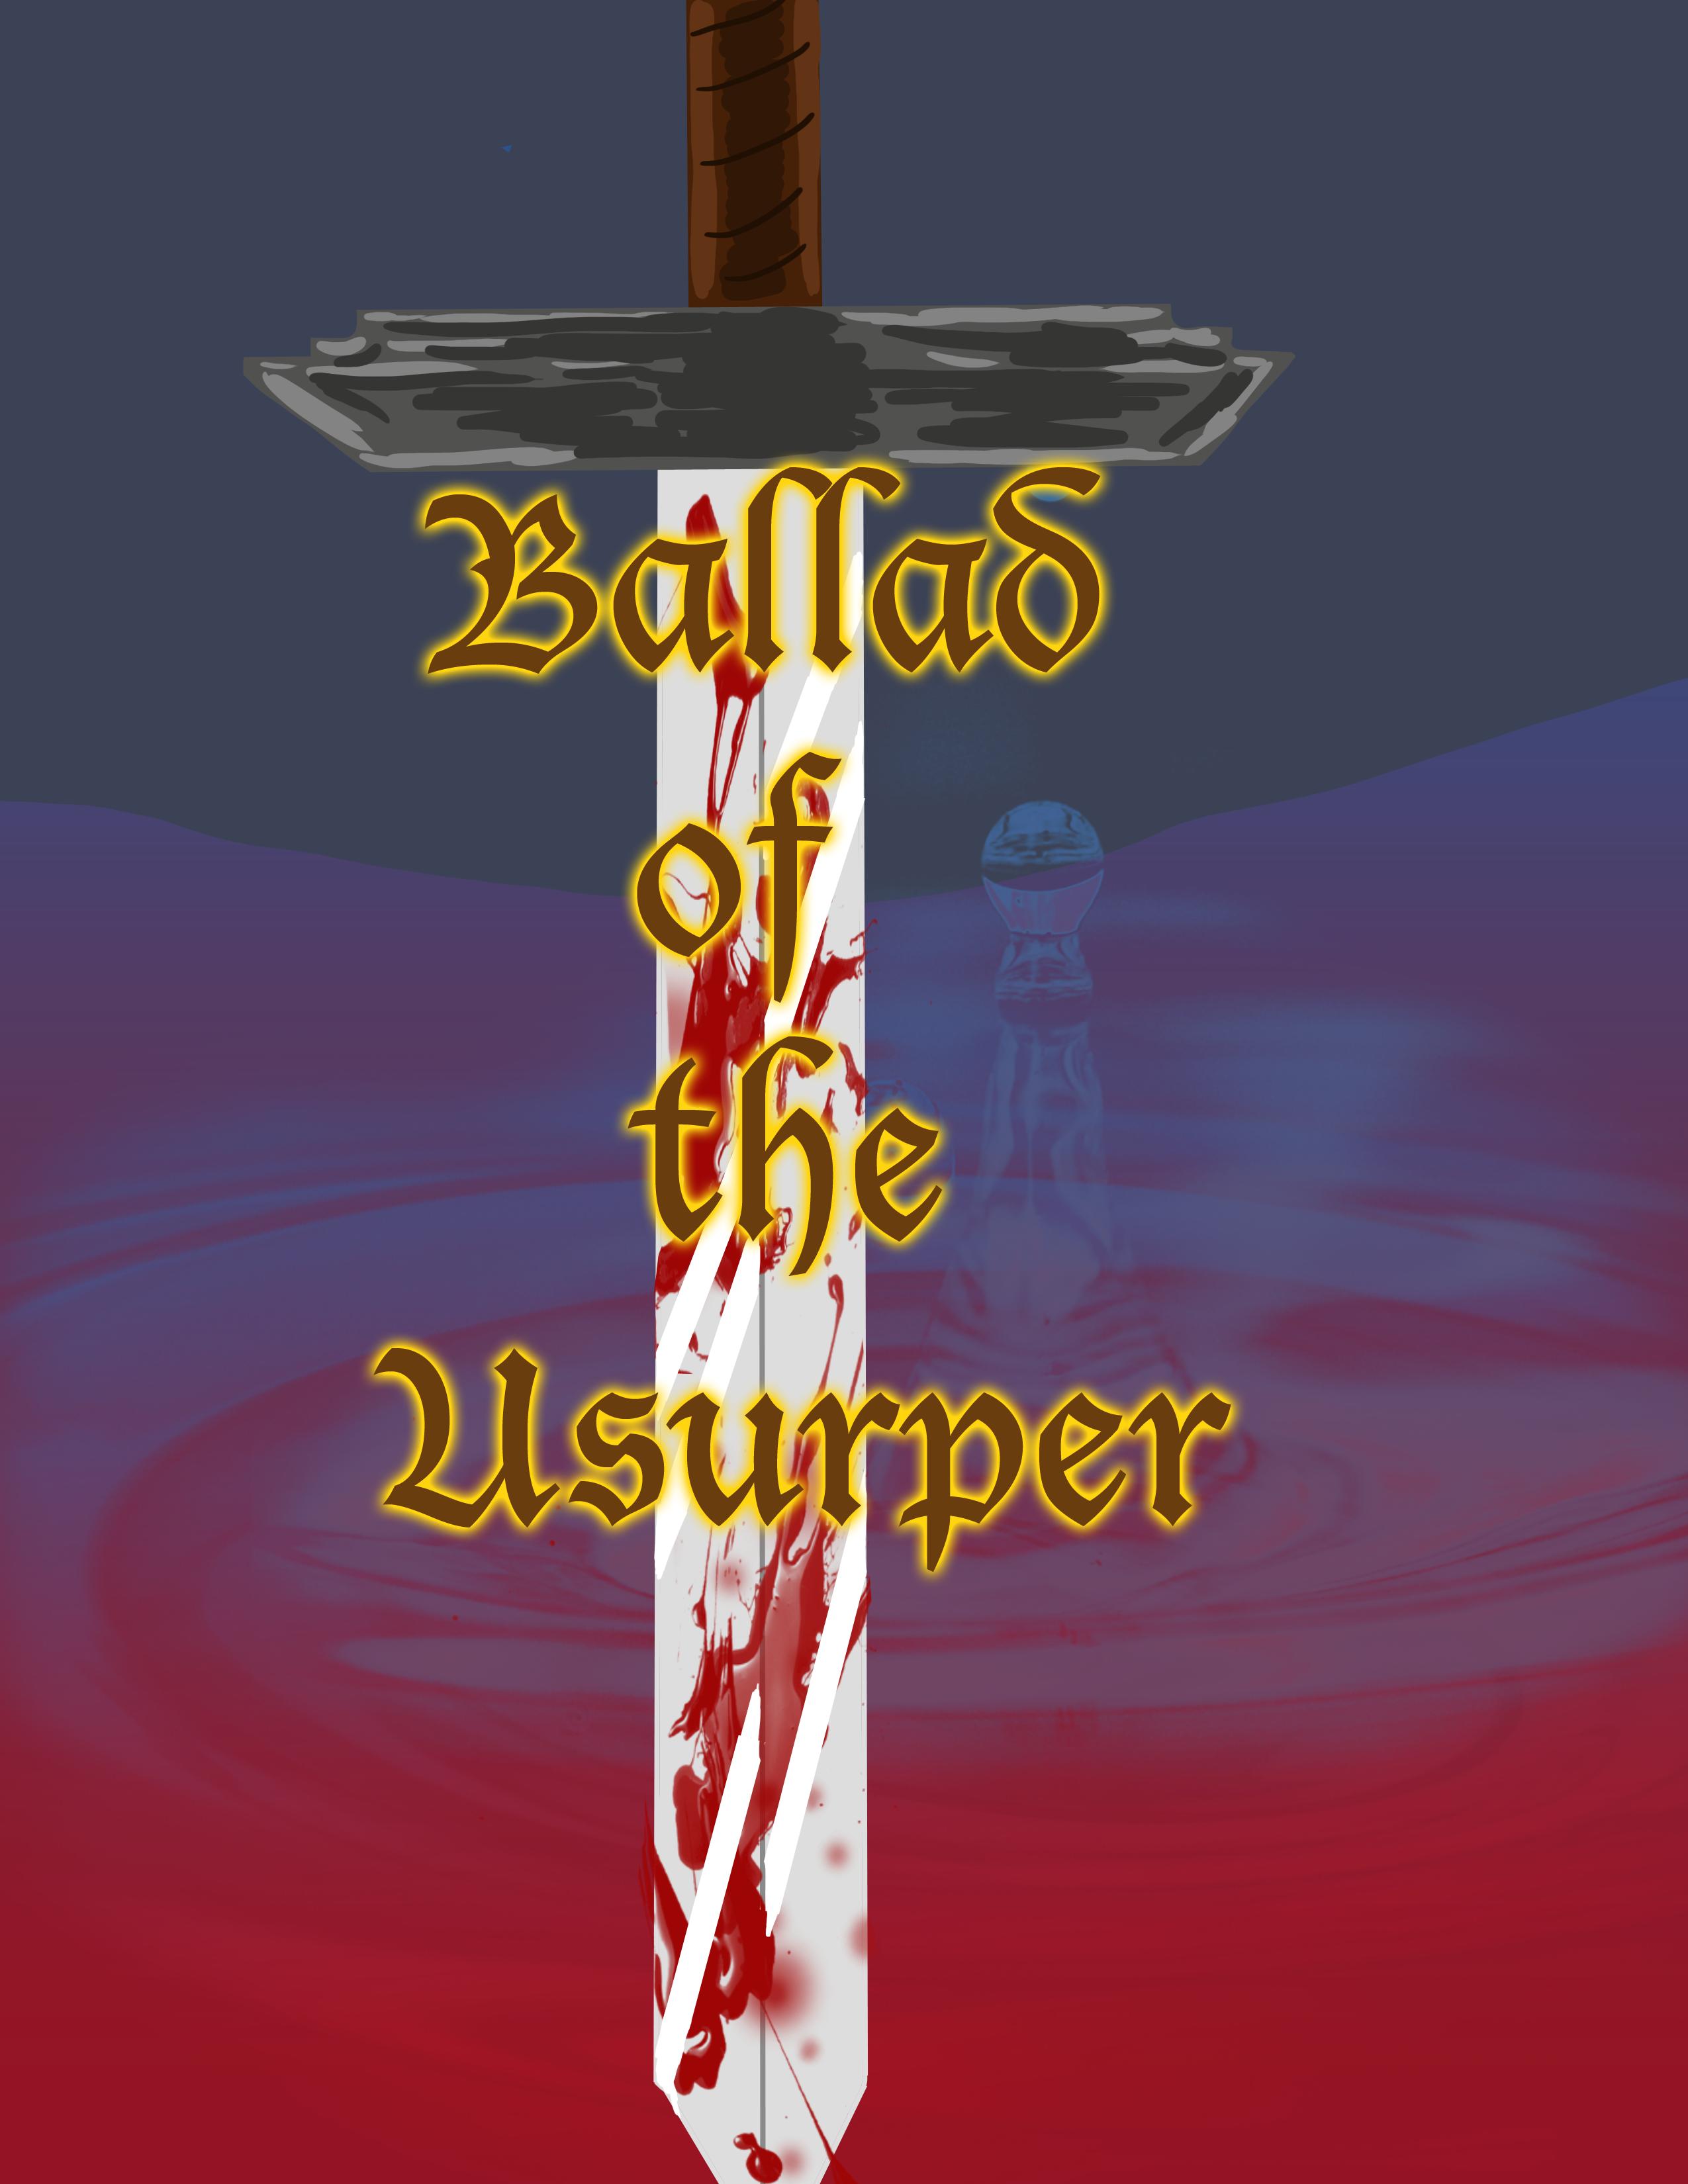 Ballad of the Usurper